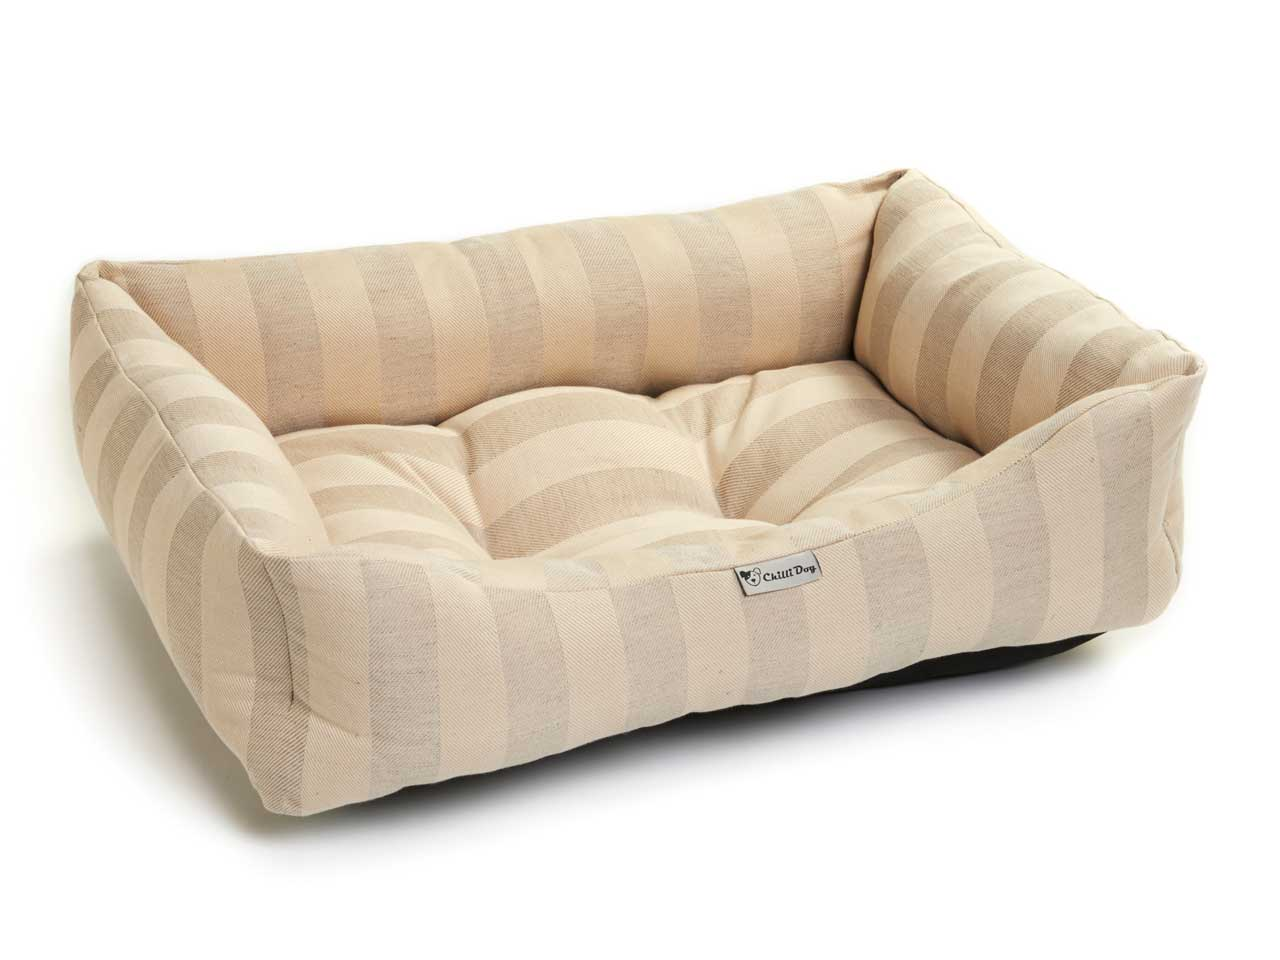 blue striped sofa uk astor sectional lounge chilli dog cotton stripe puppy bed medium large